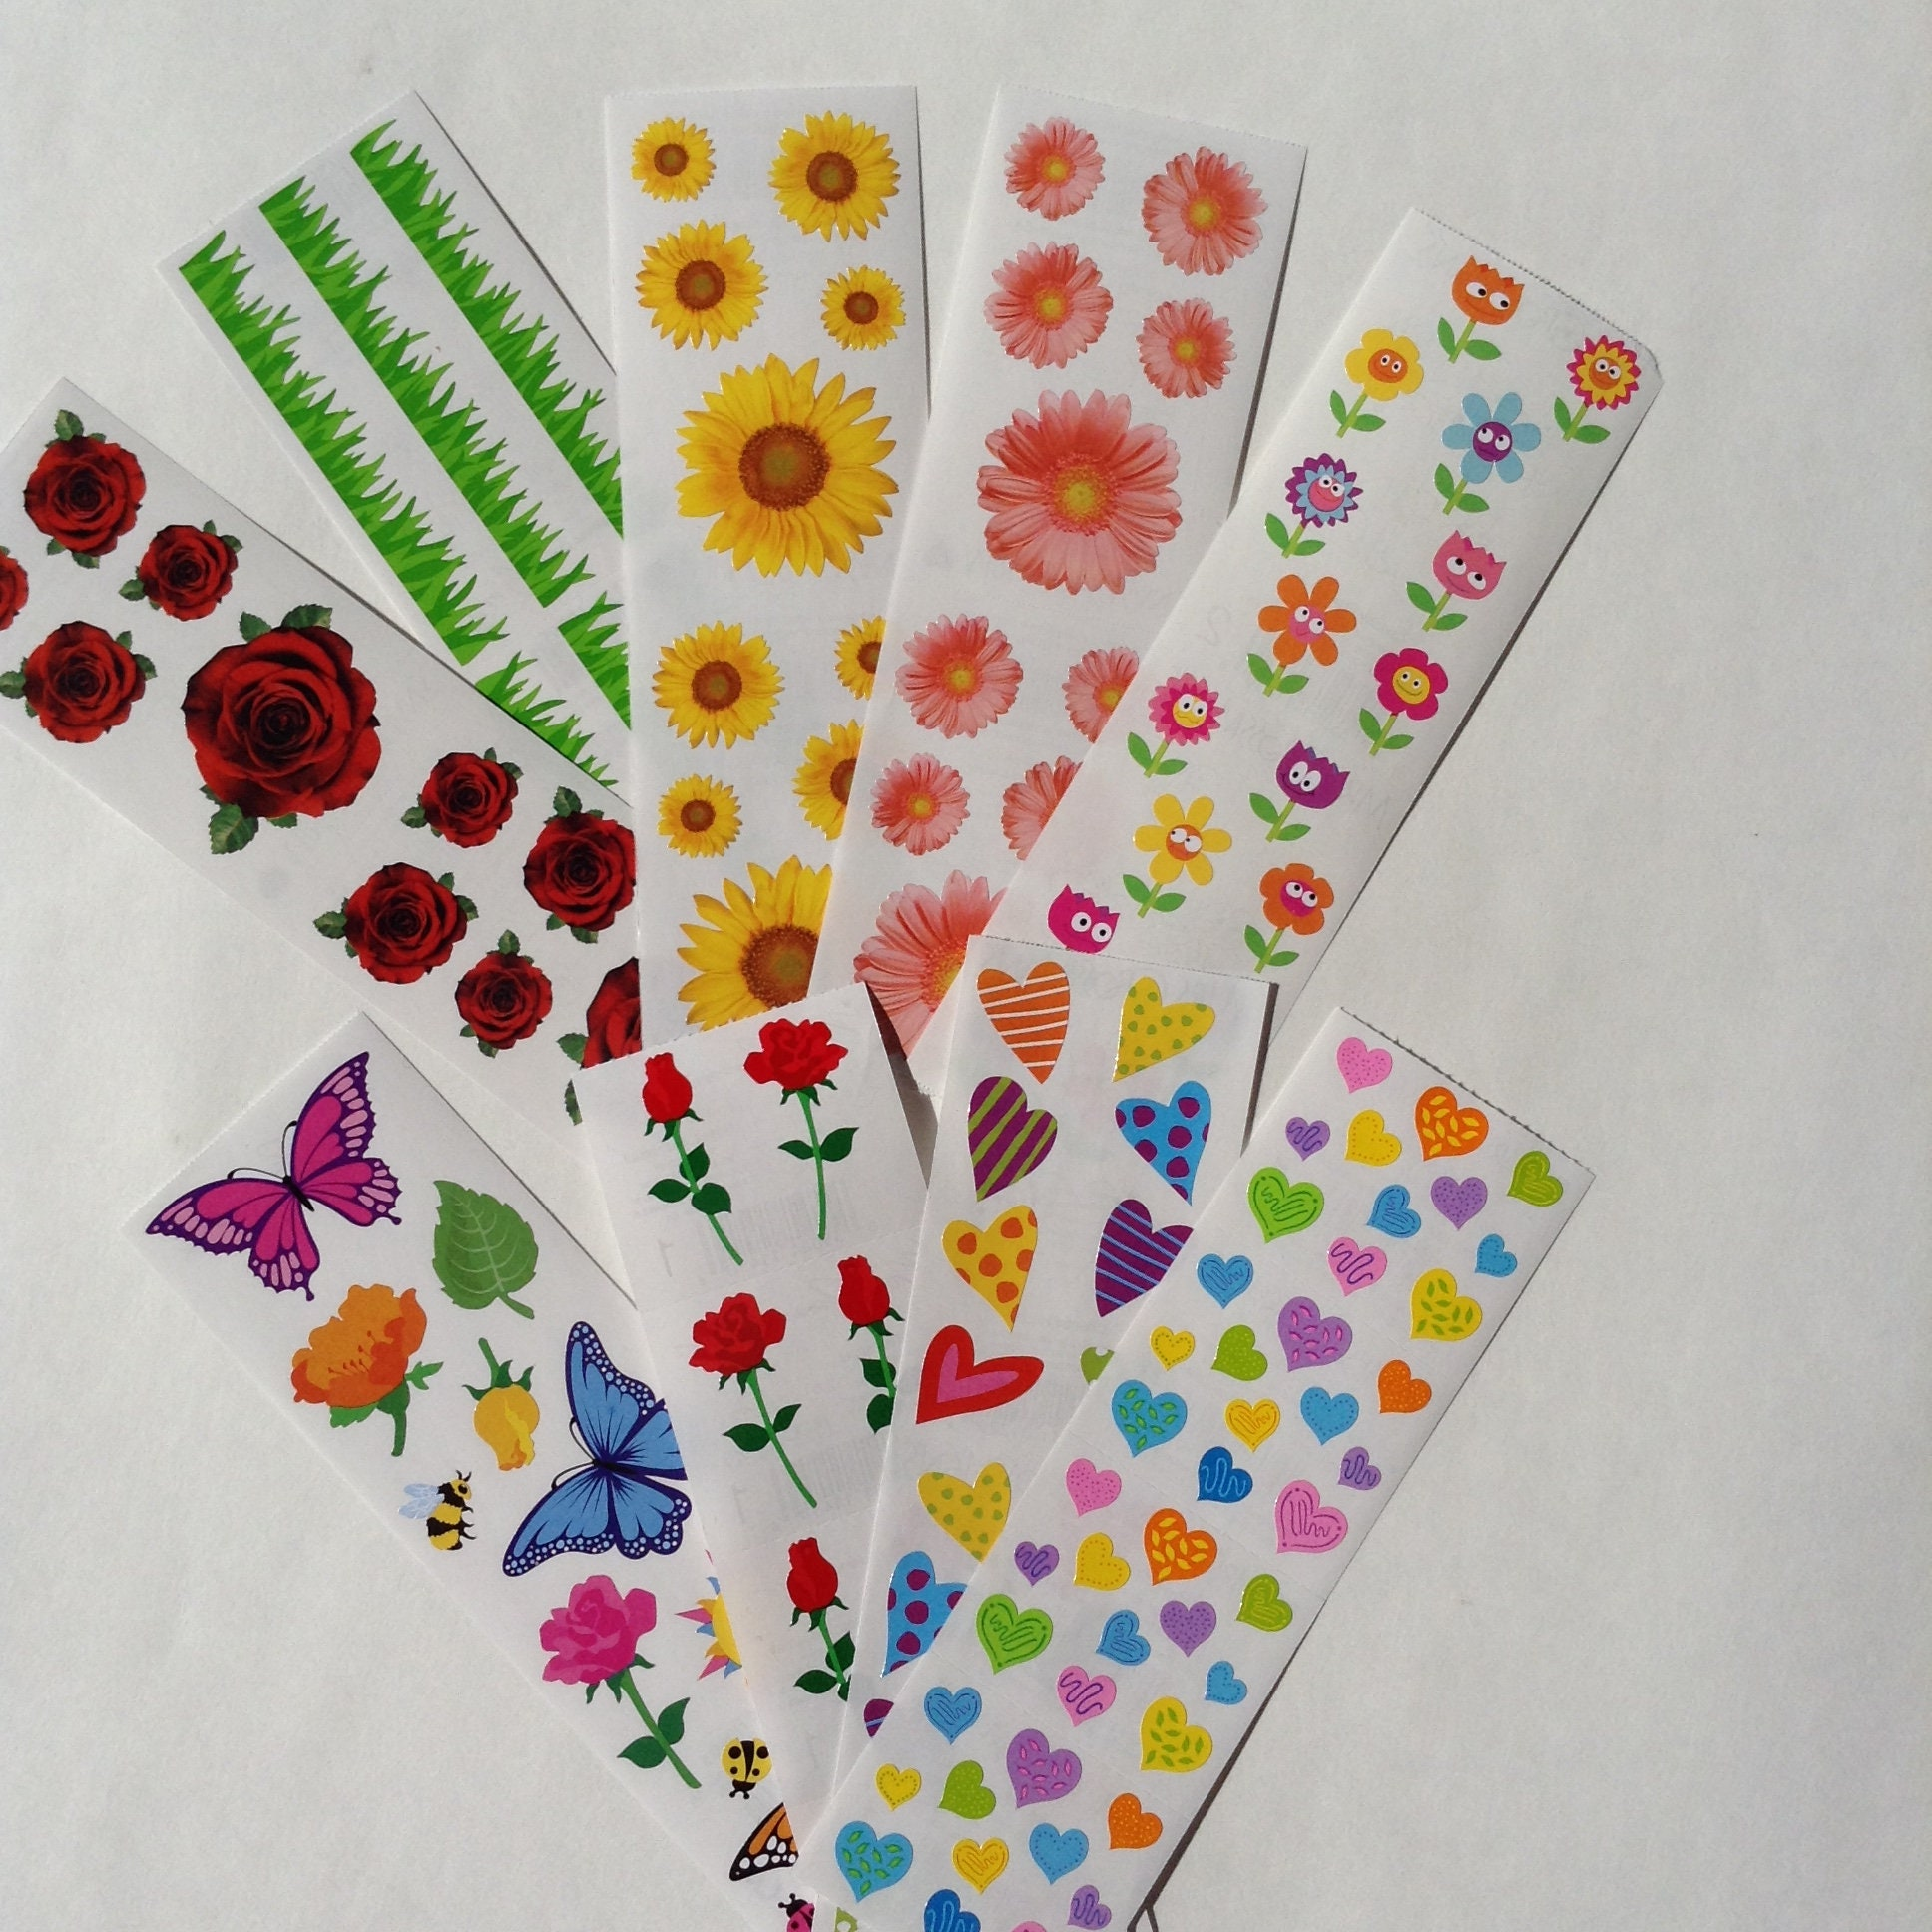 Strip of Lovely Butterfly Stickers/' Mrs Grossman BUTTERFLIES AND FLOWERS